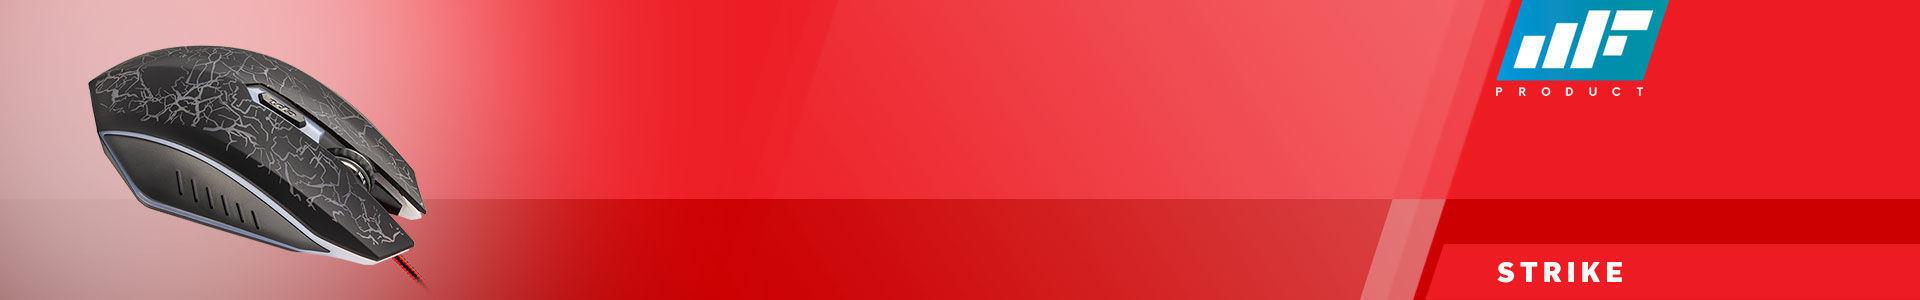 MF Product Strike 0109 Kablolu Rgb Gaming Mouse + Mouse Pad Kırmızı, tam da hayal ettiğin gibi!